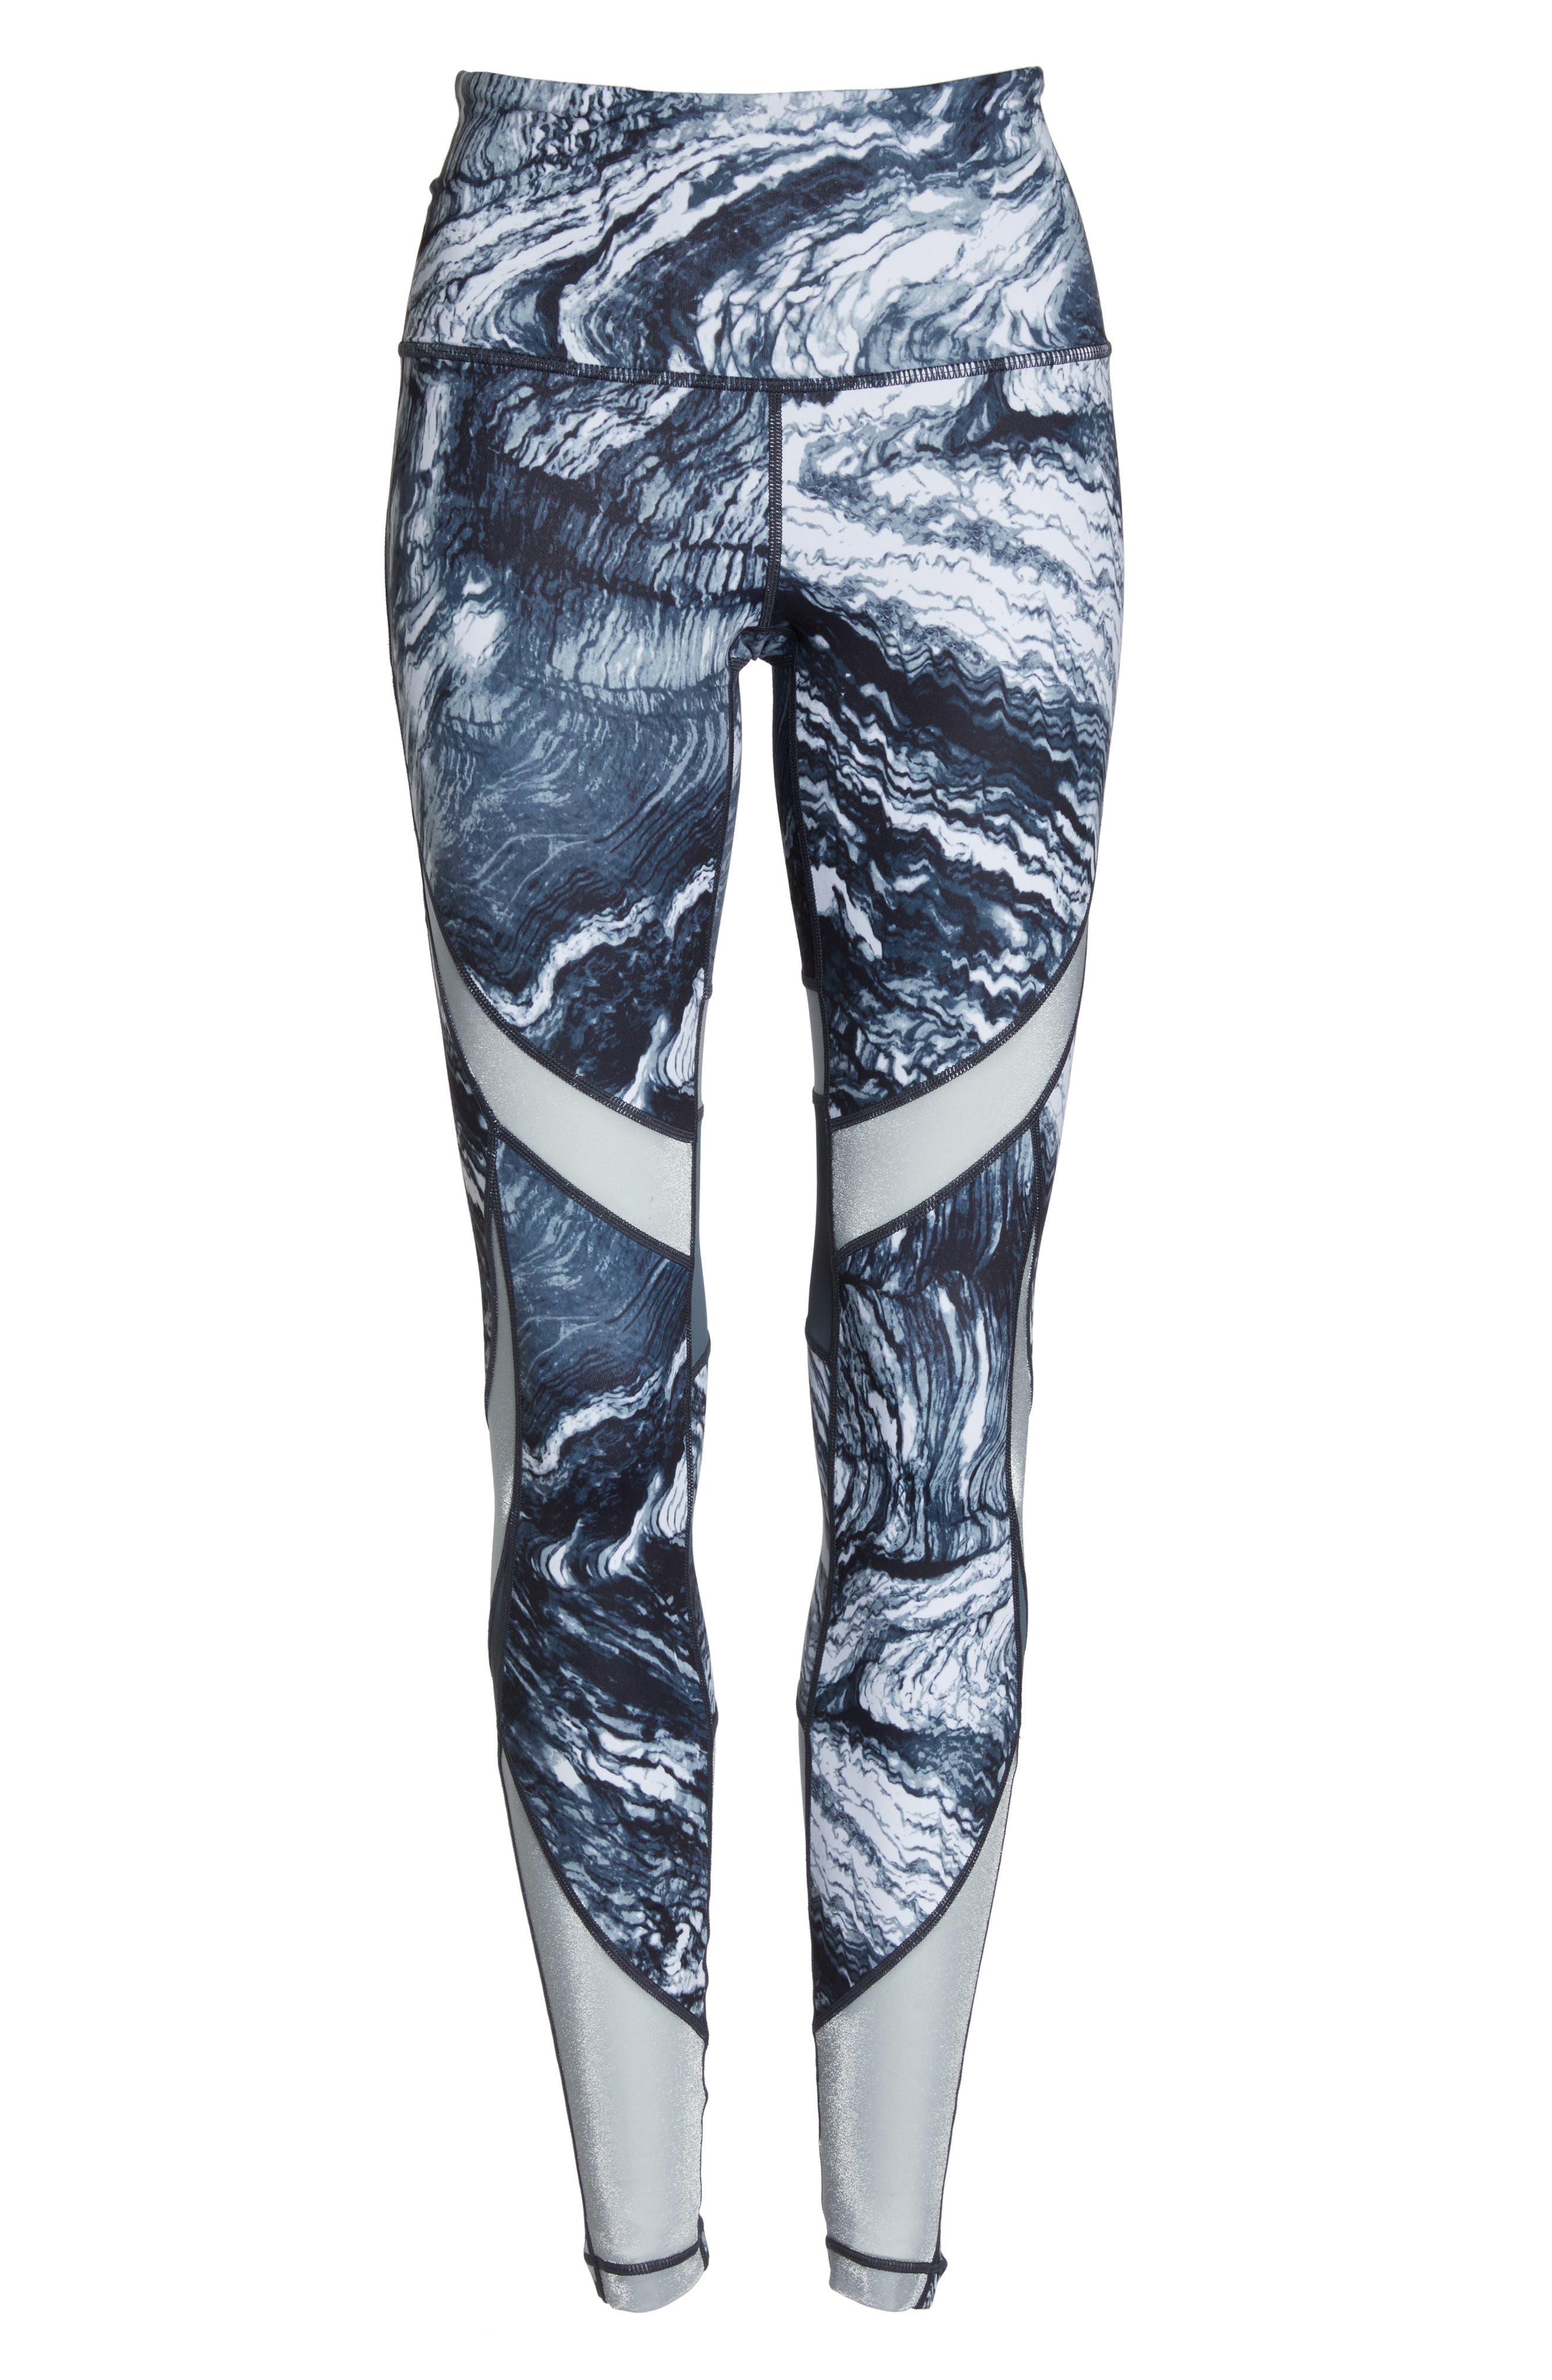 Alternate Image 1 Selected - Zella Define High Waist Leggings